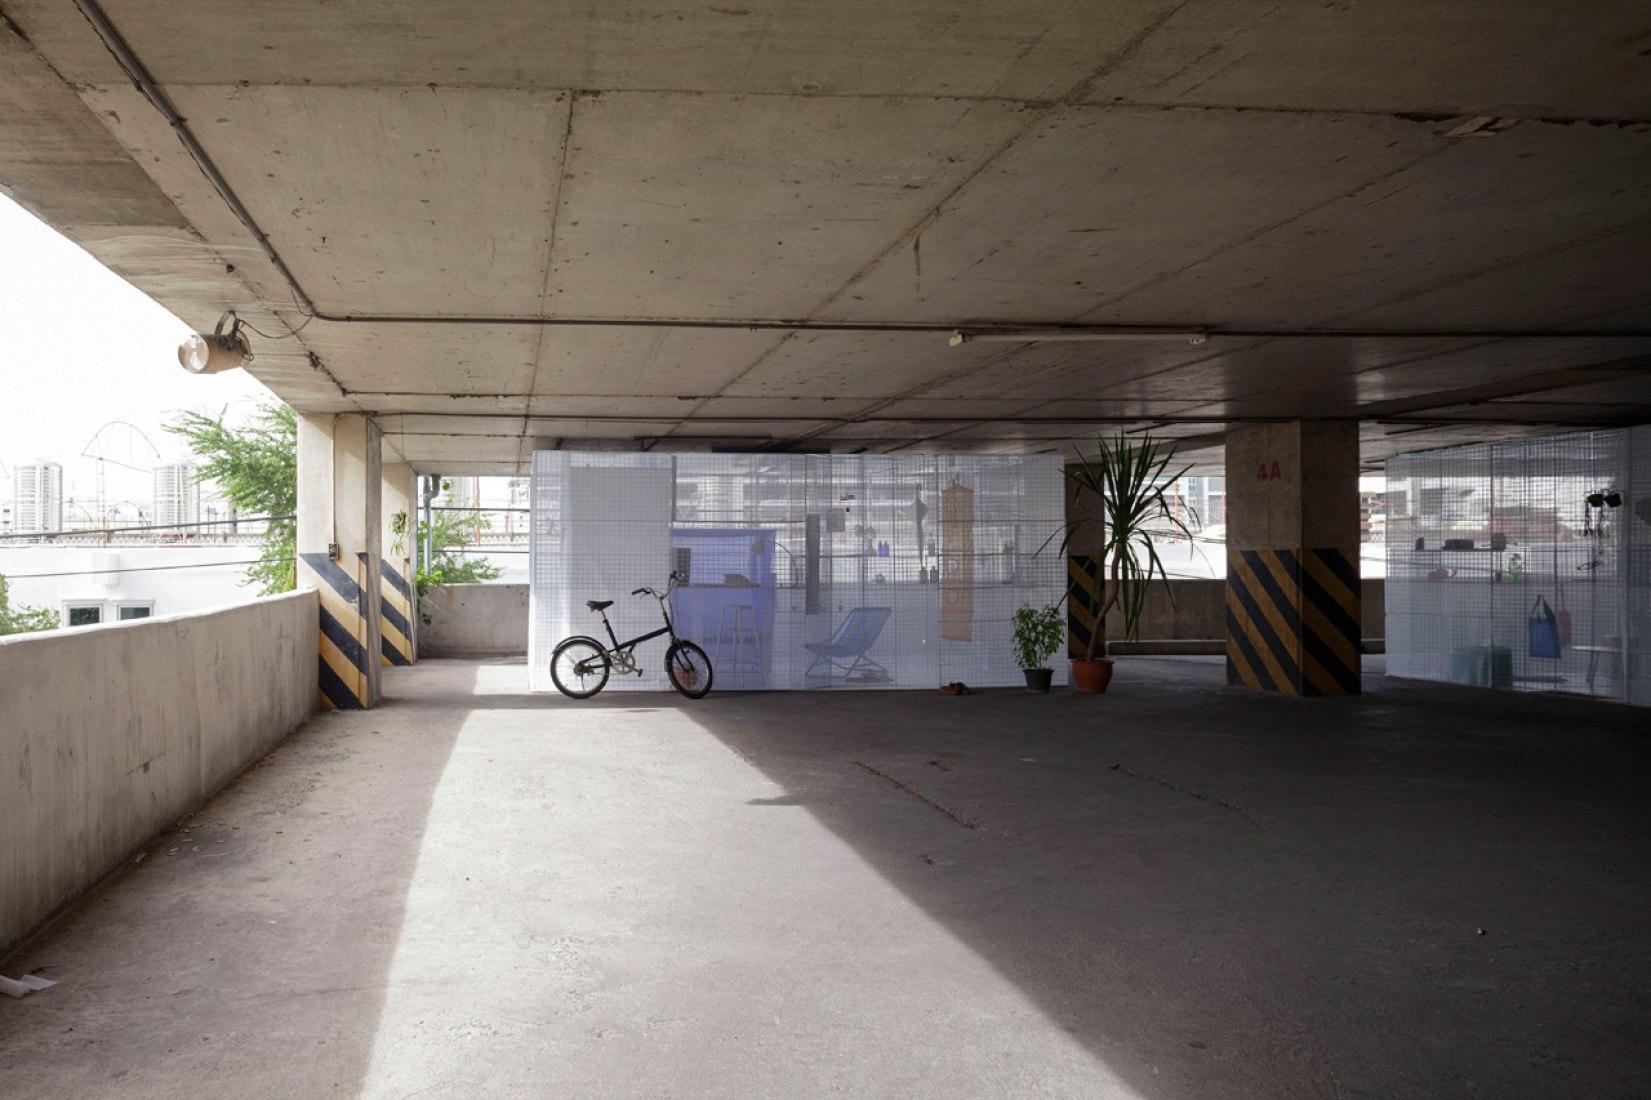 Exteiror view. Minimalist Pop-up Houses in a parking garage of Bangkok. Photography © Soopakorn Srisakul.